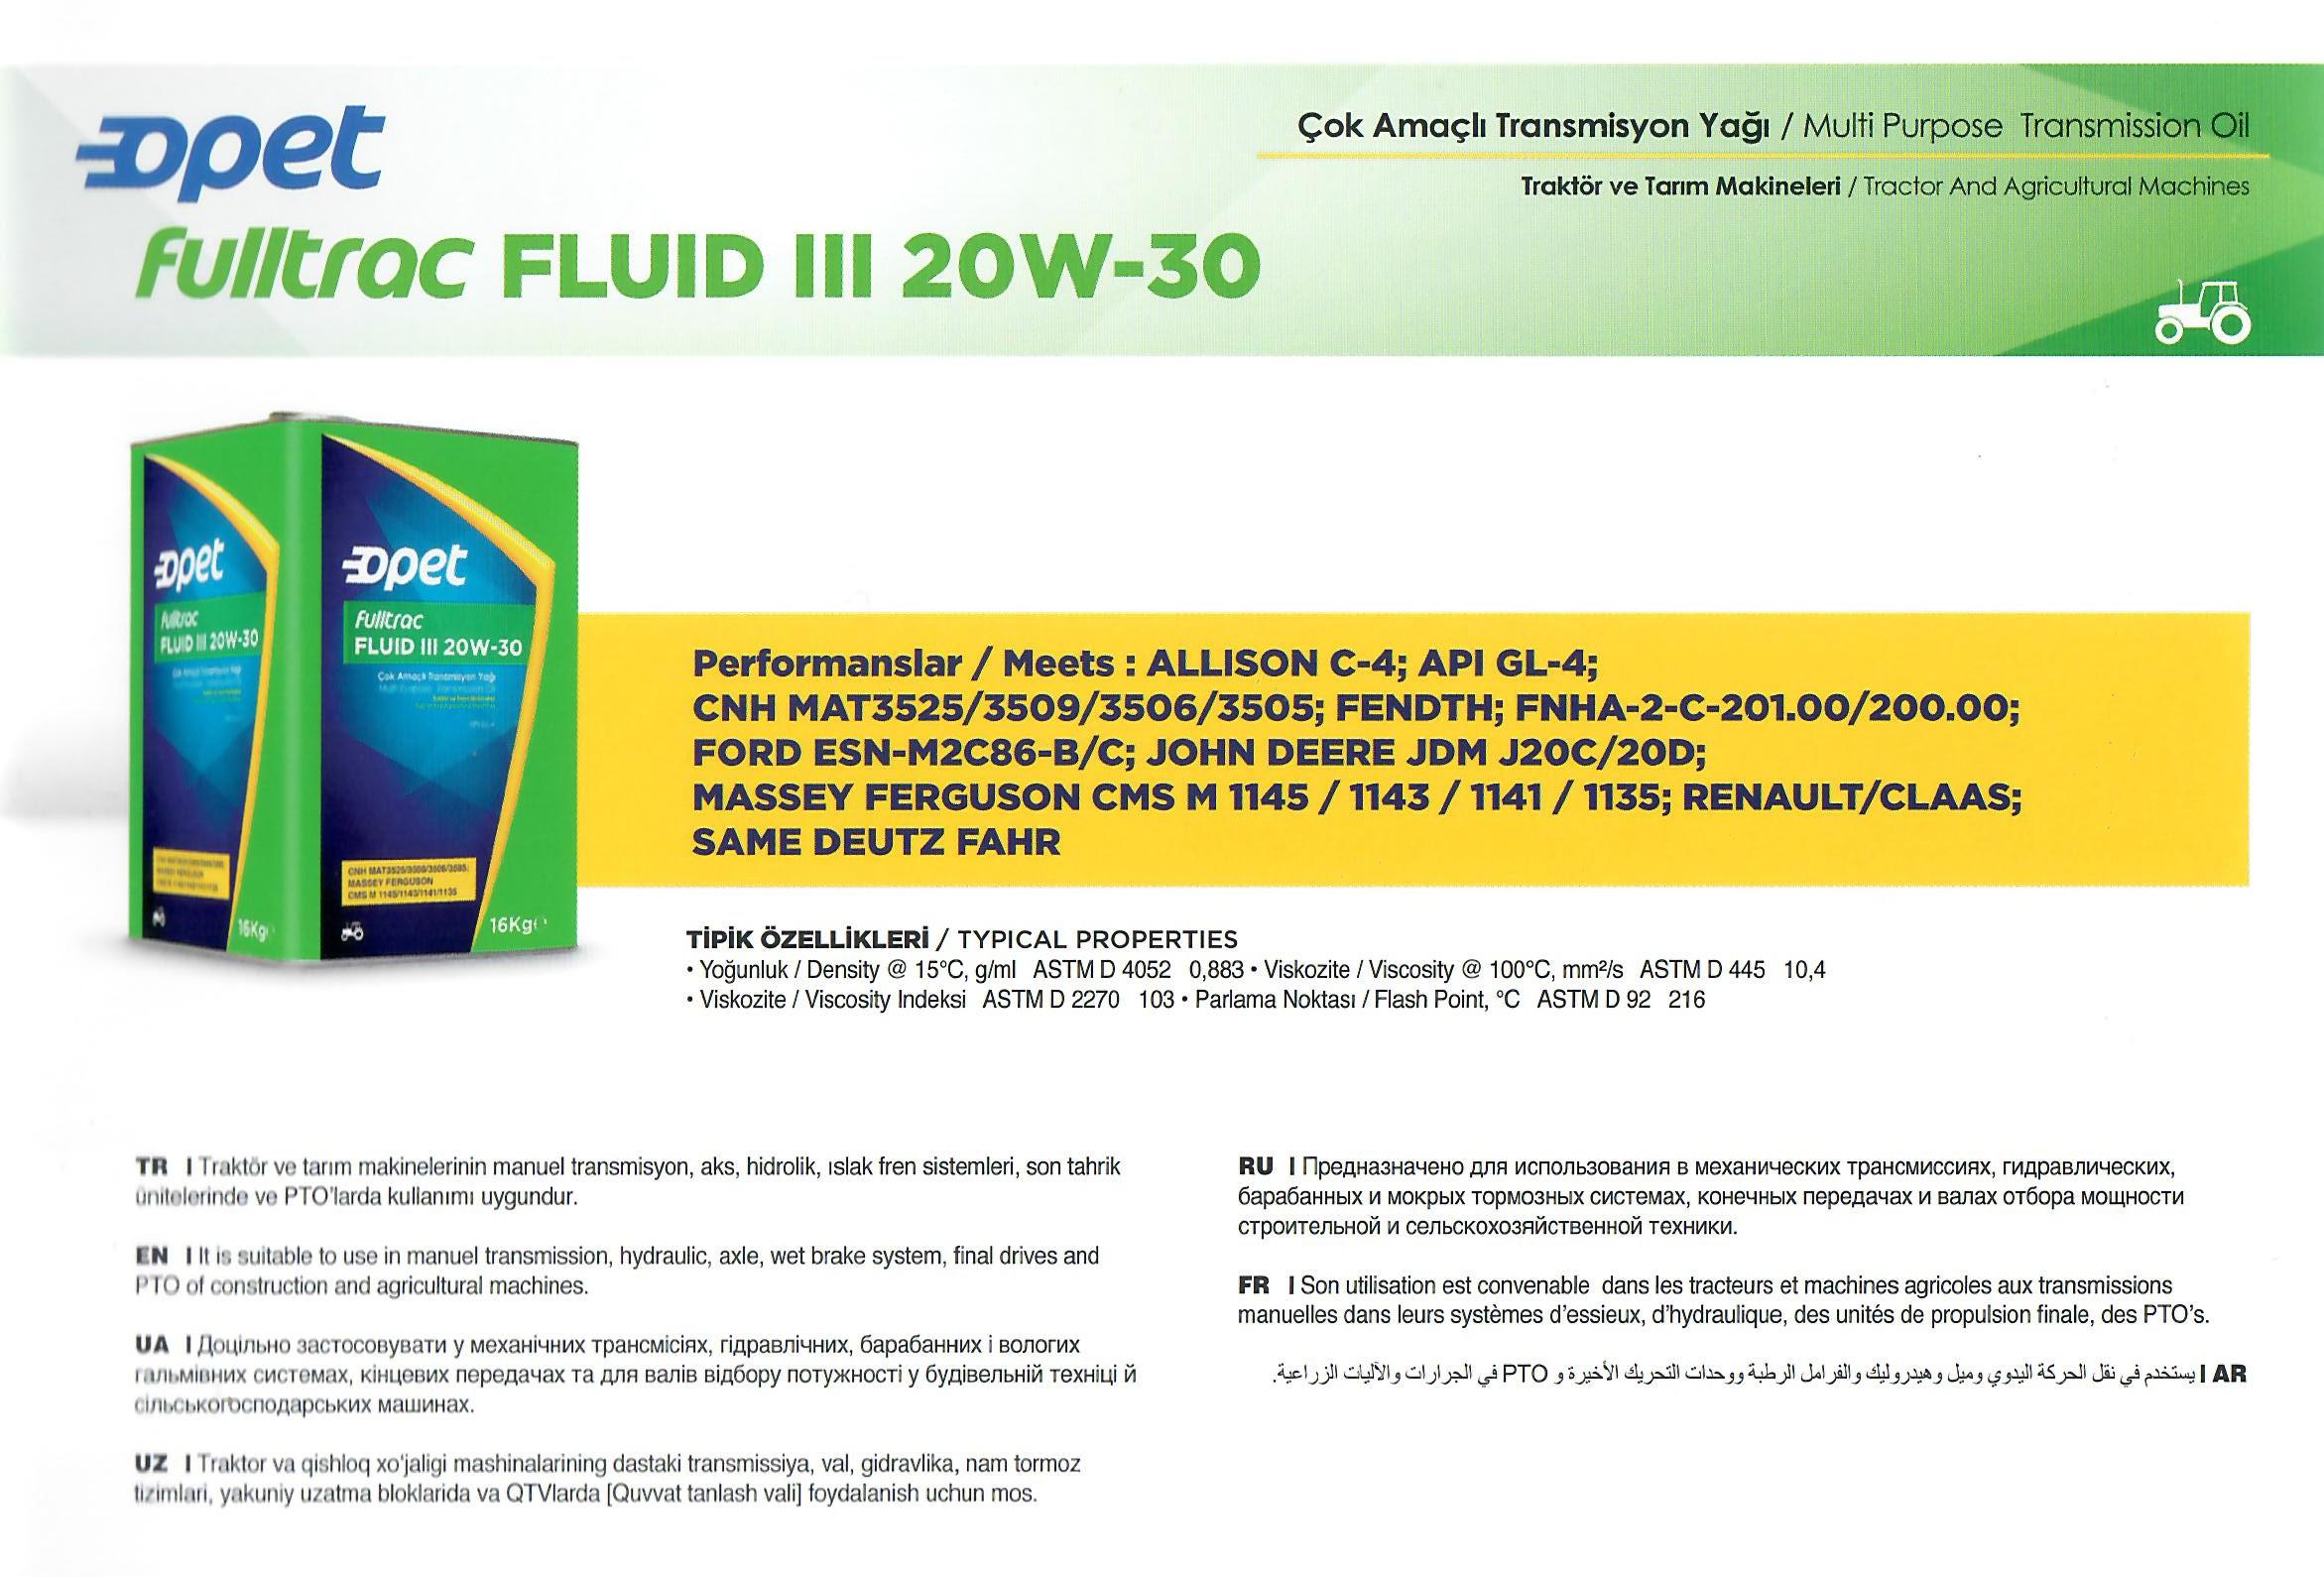 Fulltrac Fluid III 20W-30